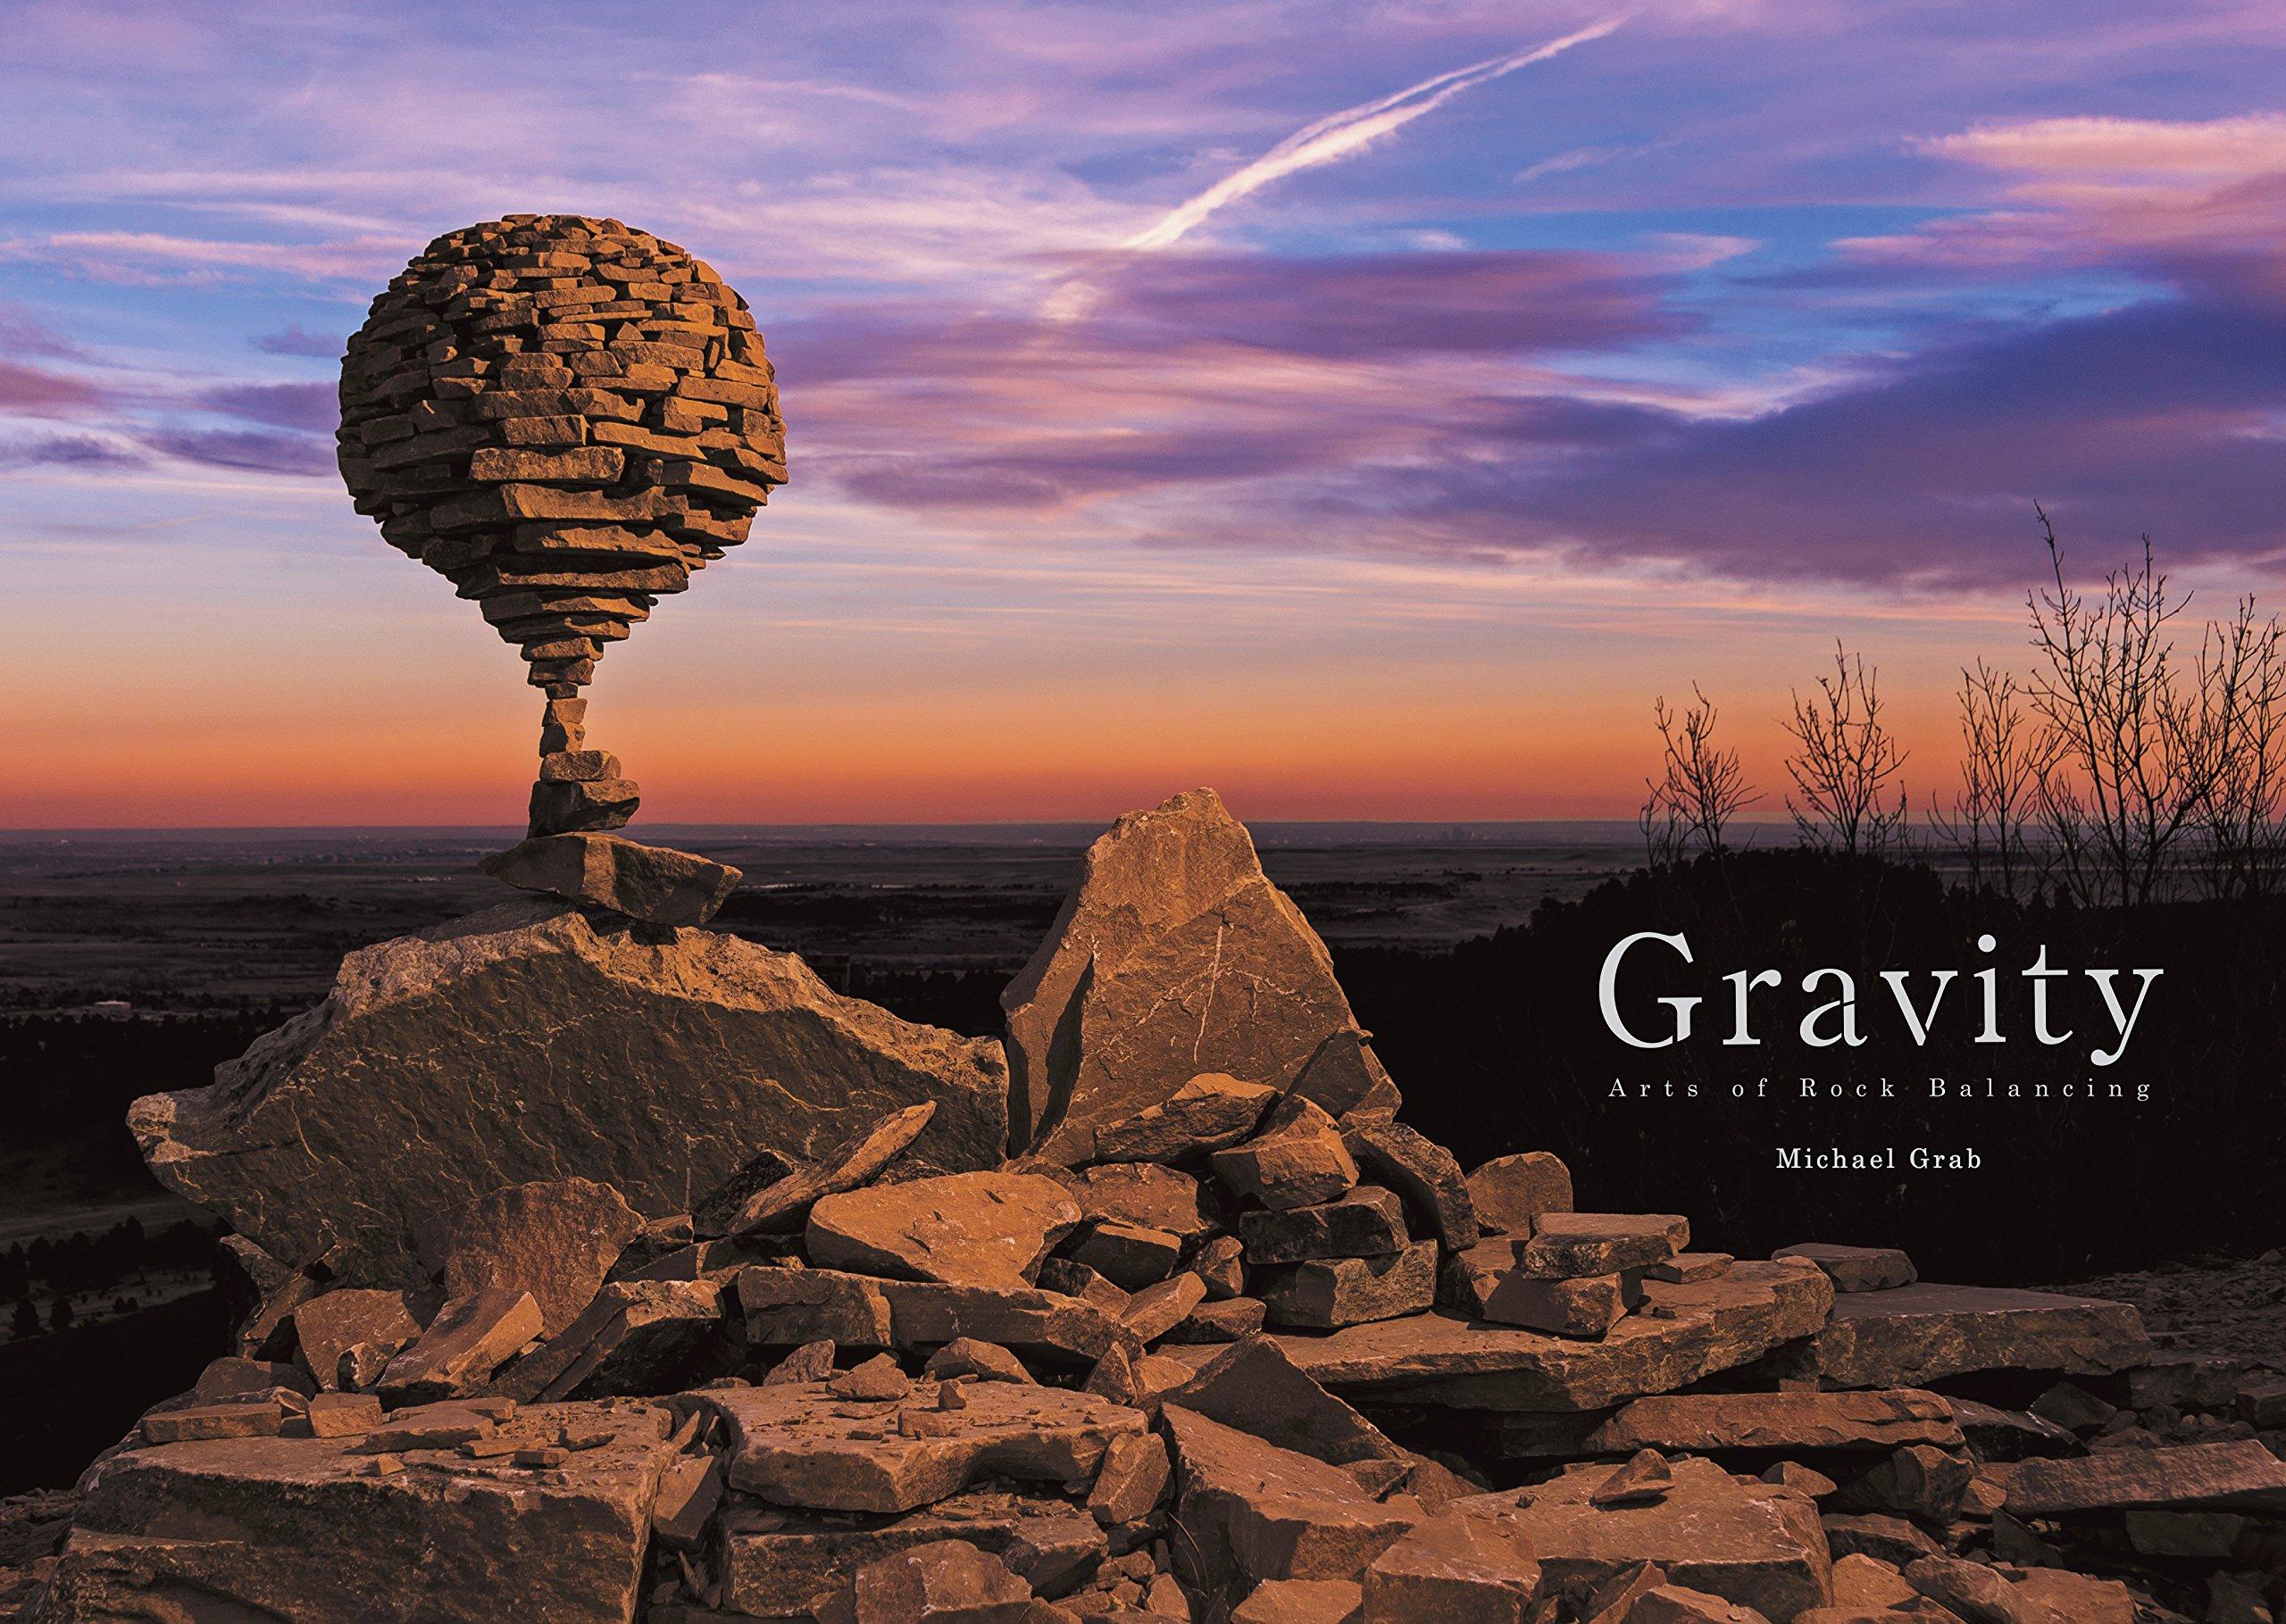 083f38107e64 Gravity - Arts of Rock Balancing  Michael Grab  9784773379532 ...